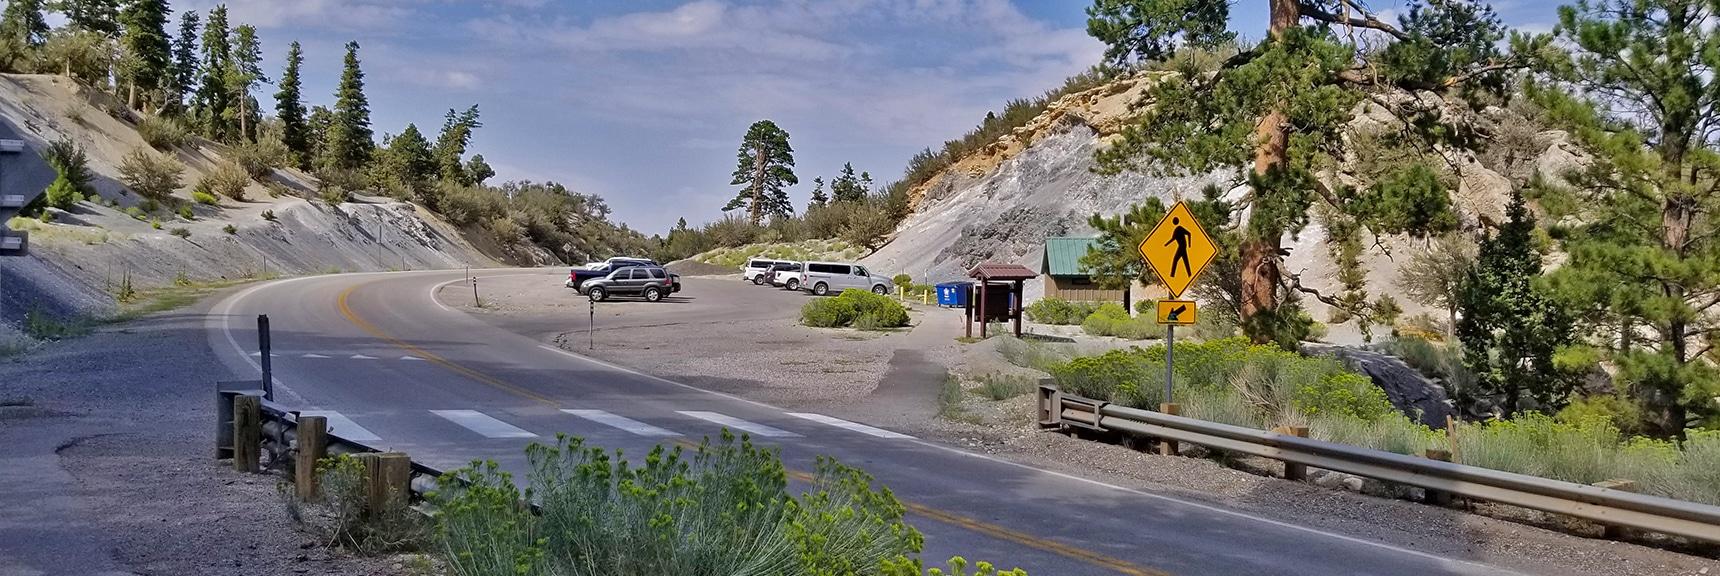 Parking on Deer Creek Road for Deer Creek Picnic Area   Deer Creek Rd - Mummy Cliffs - Mummy Springs - Raintree - Fletcher Peak - Cougar Ridge Trail Circuit   Mt Charleston Wilderness   Spring Mountains, Nevada